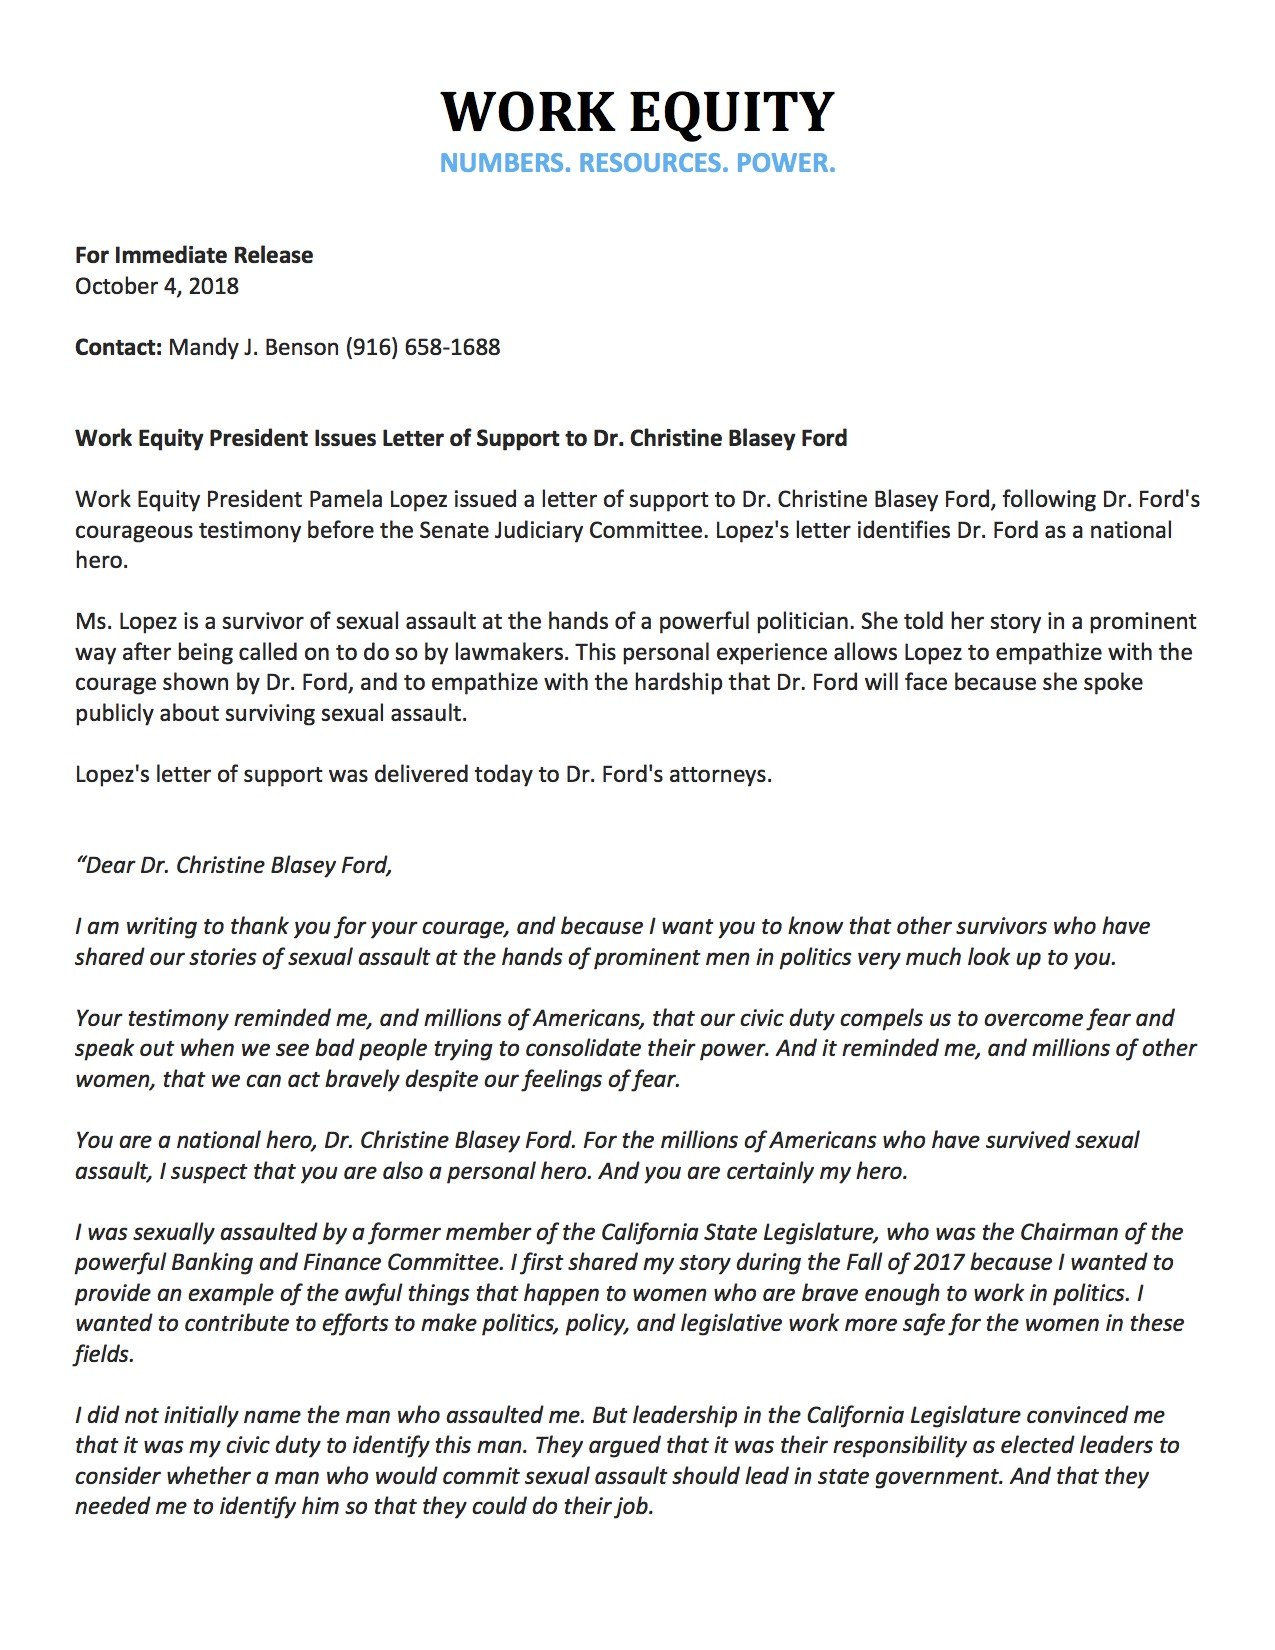 WE Ford Press Release 10.4.2018.jpg